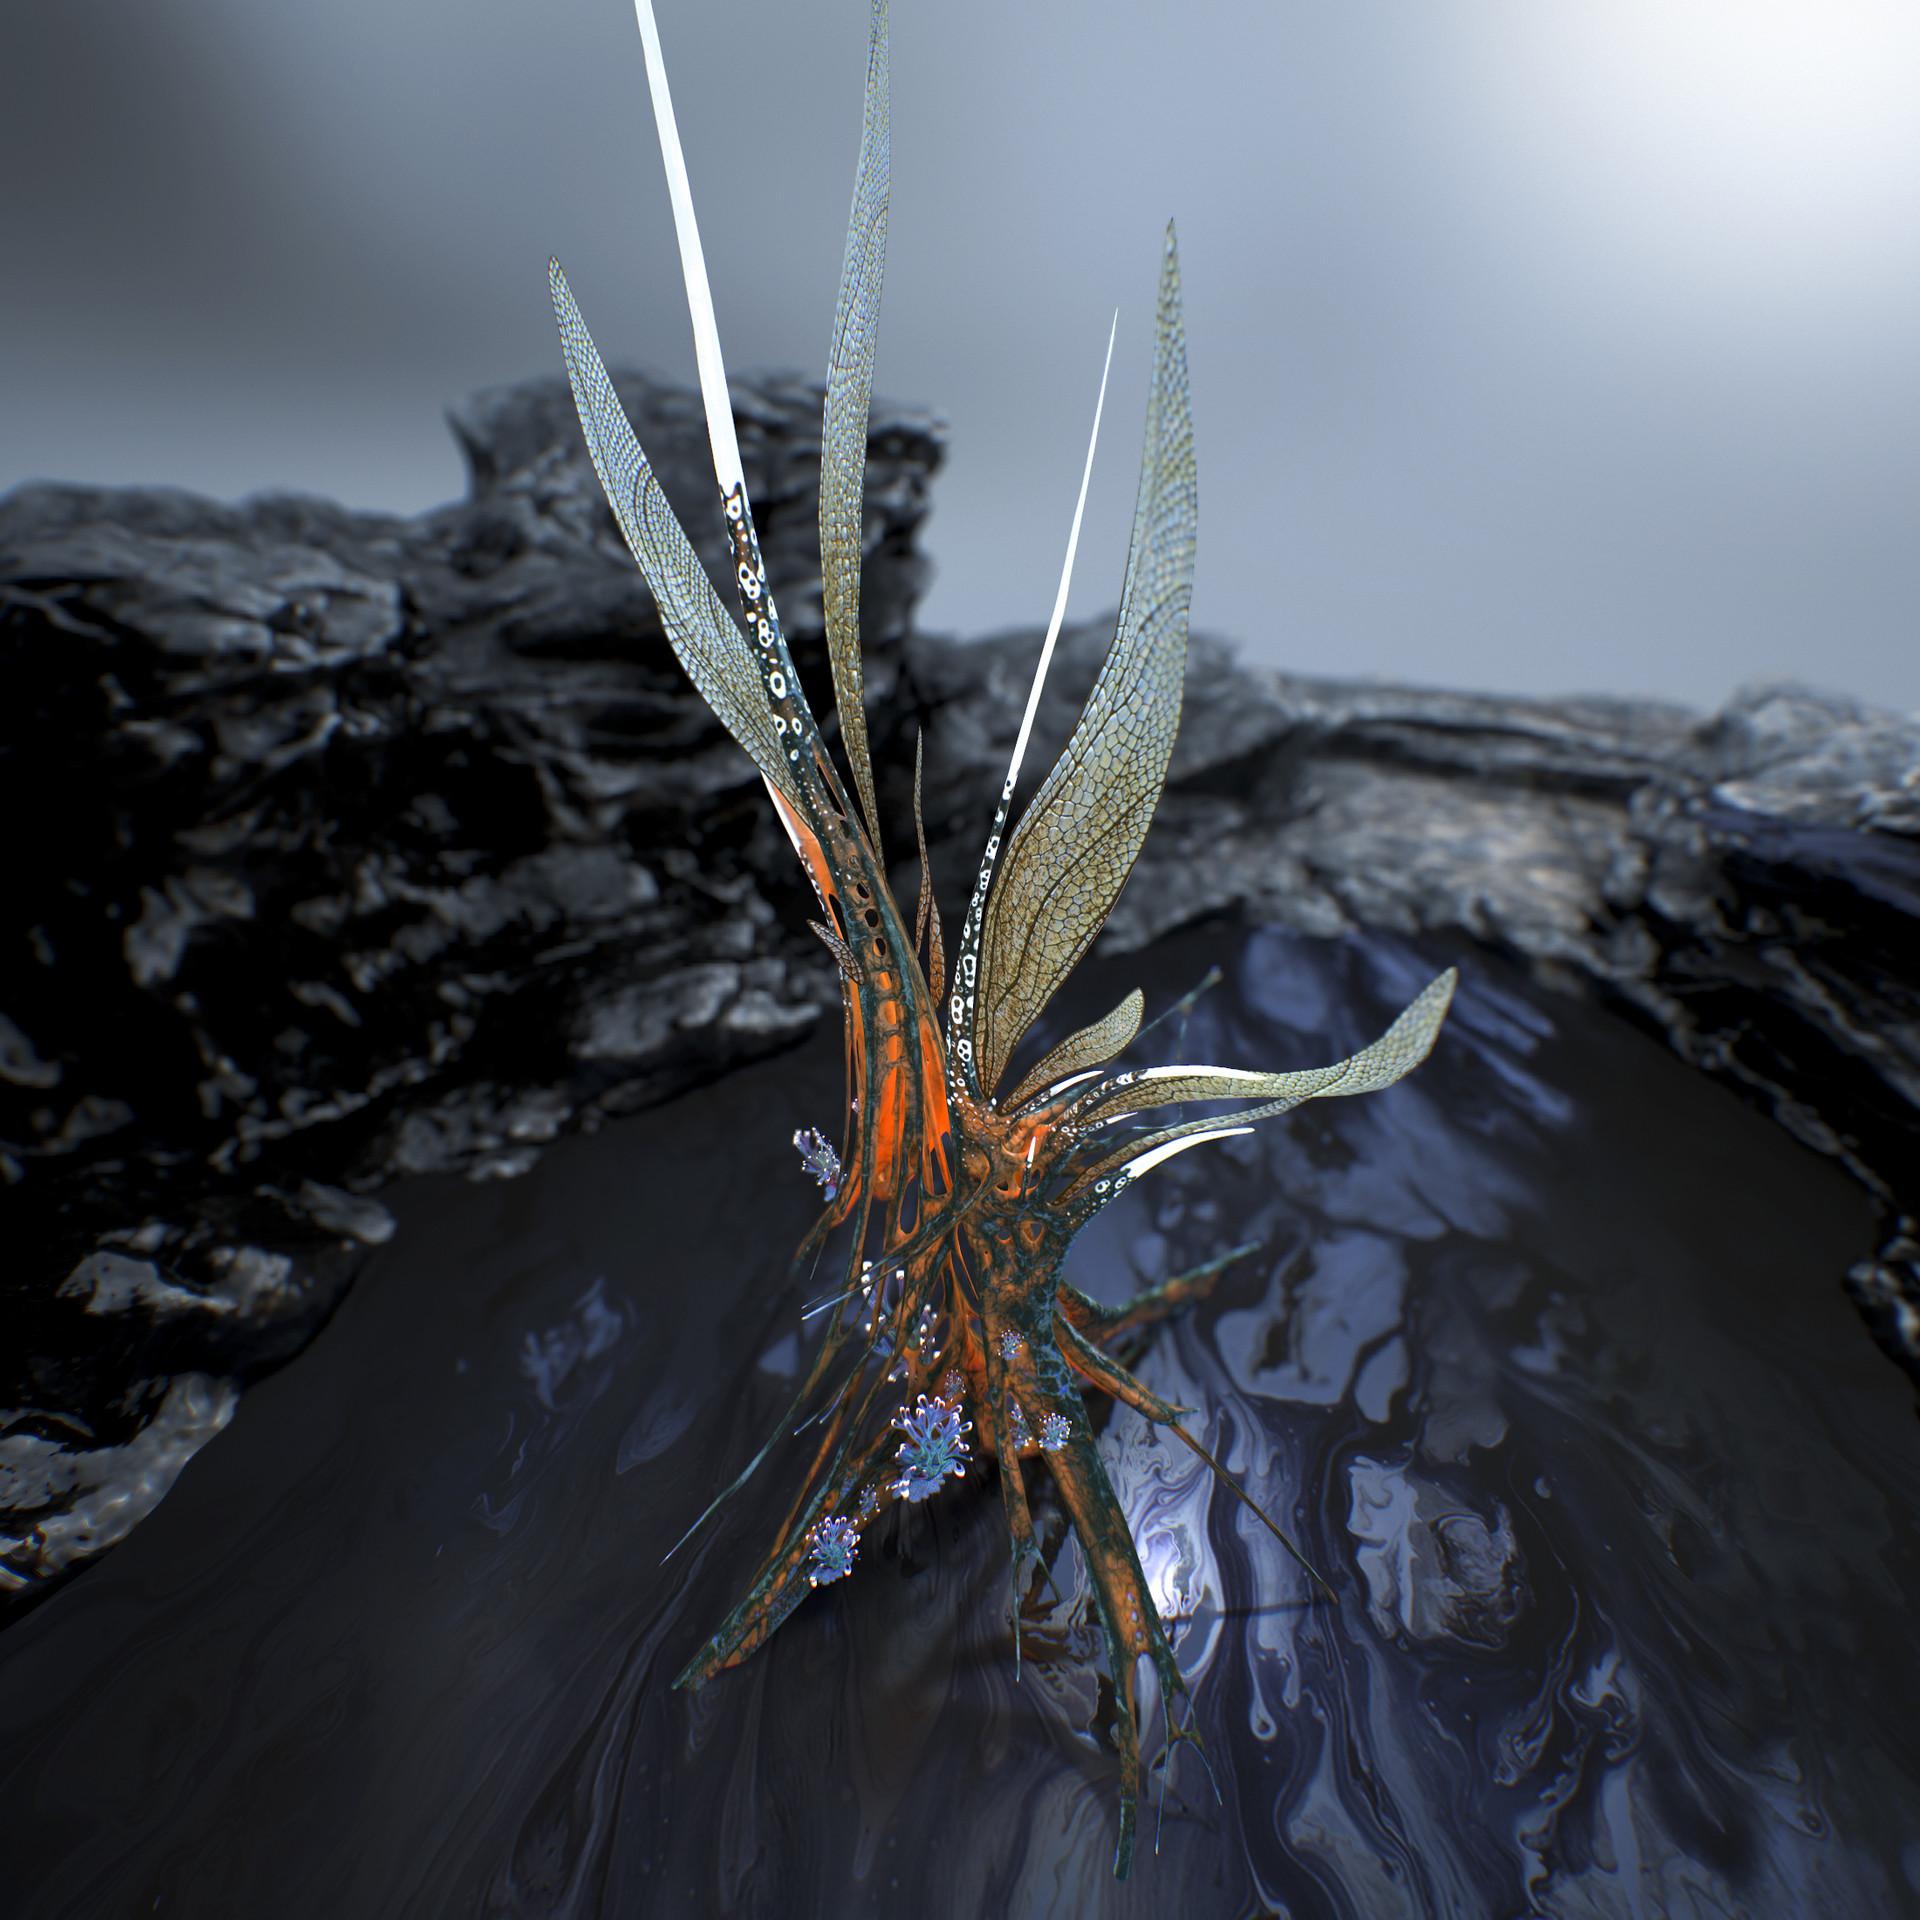 Johan de leenheer alien fern misota spletinus39